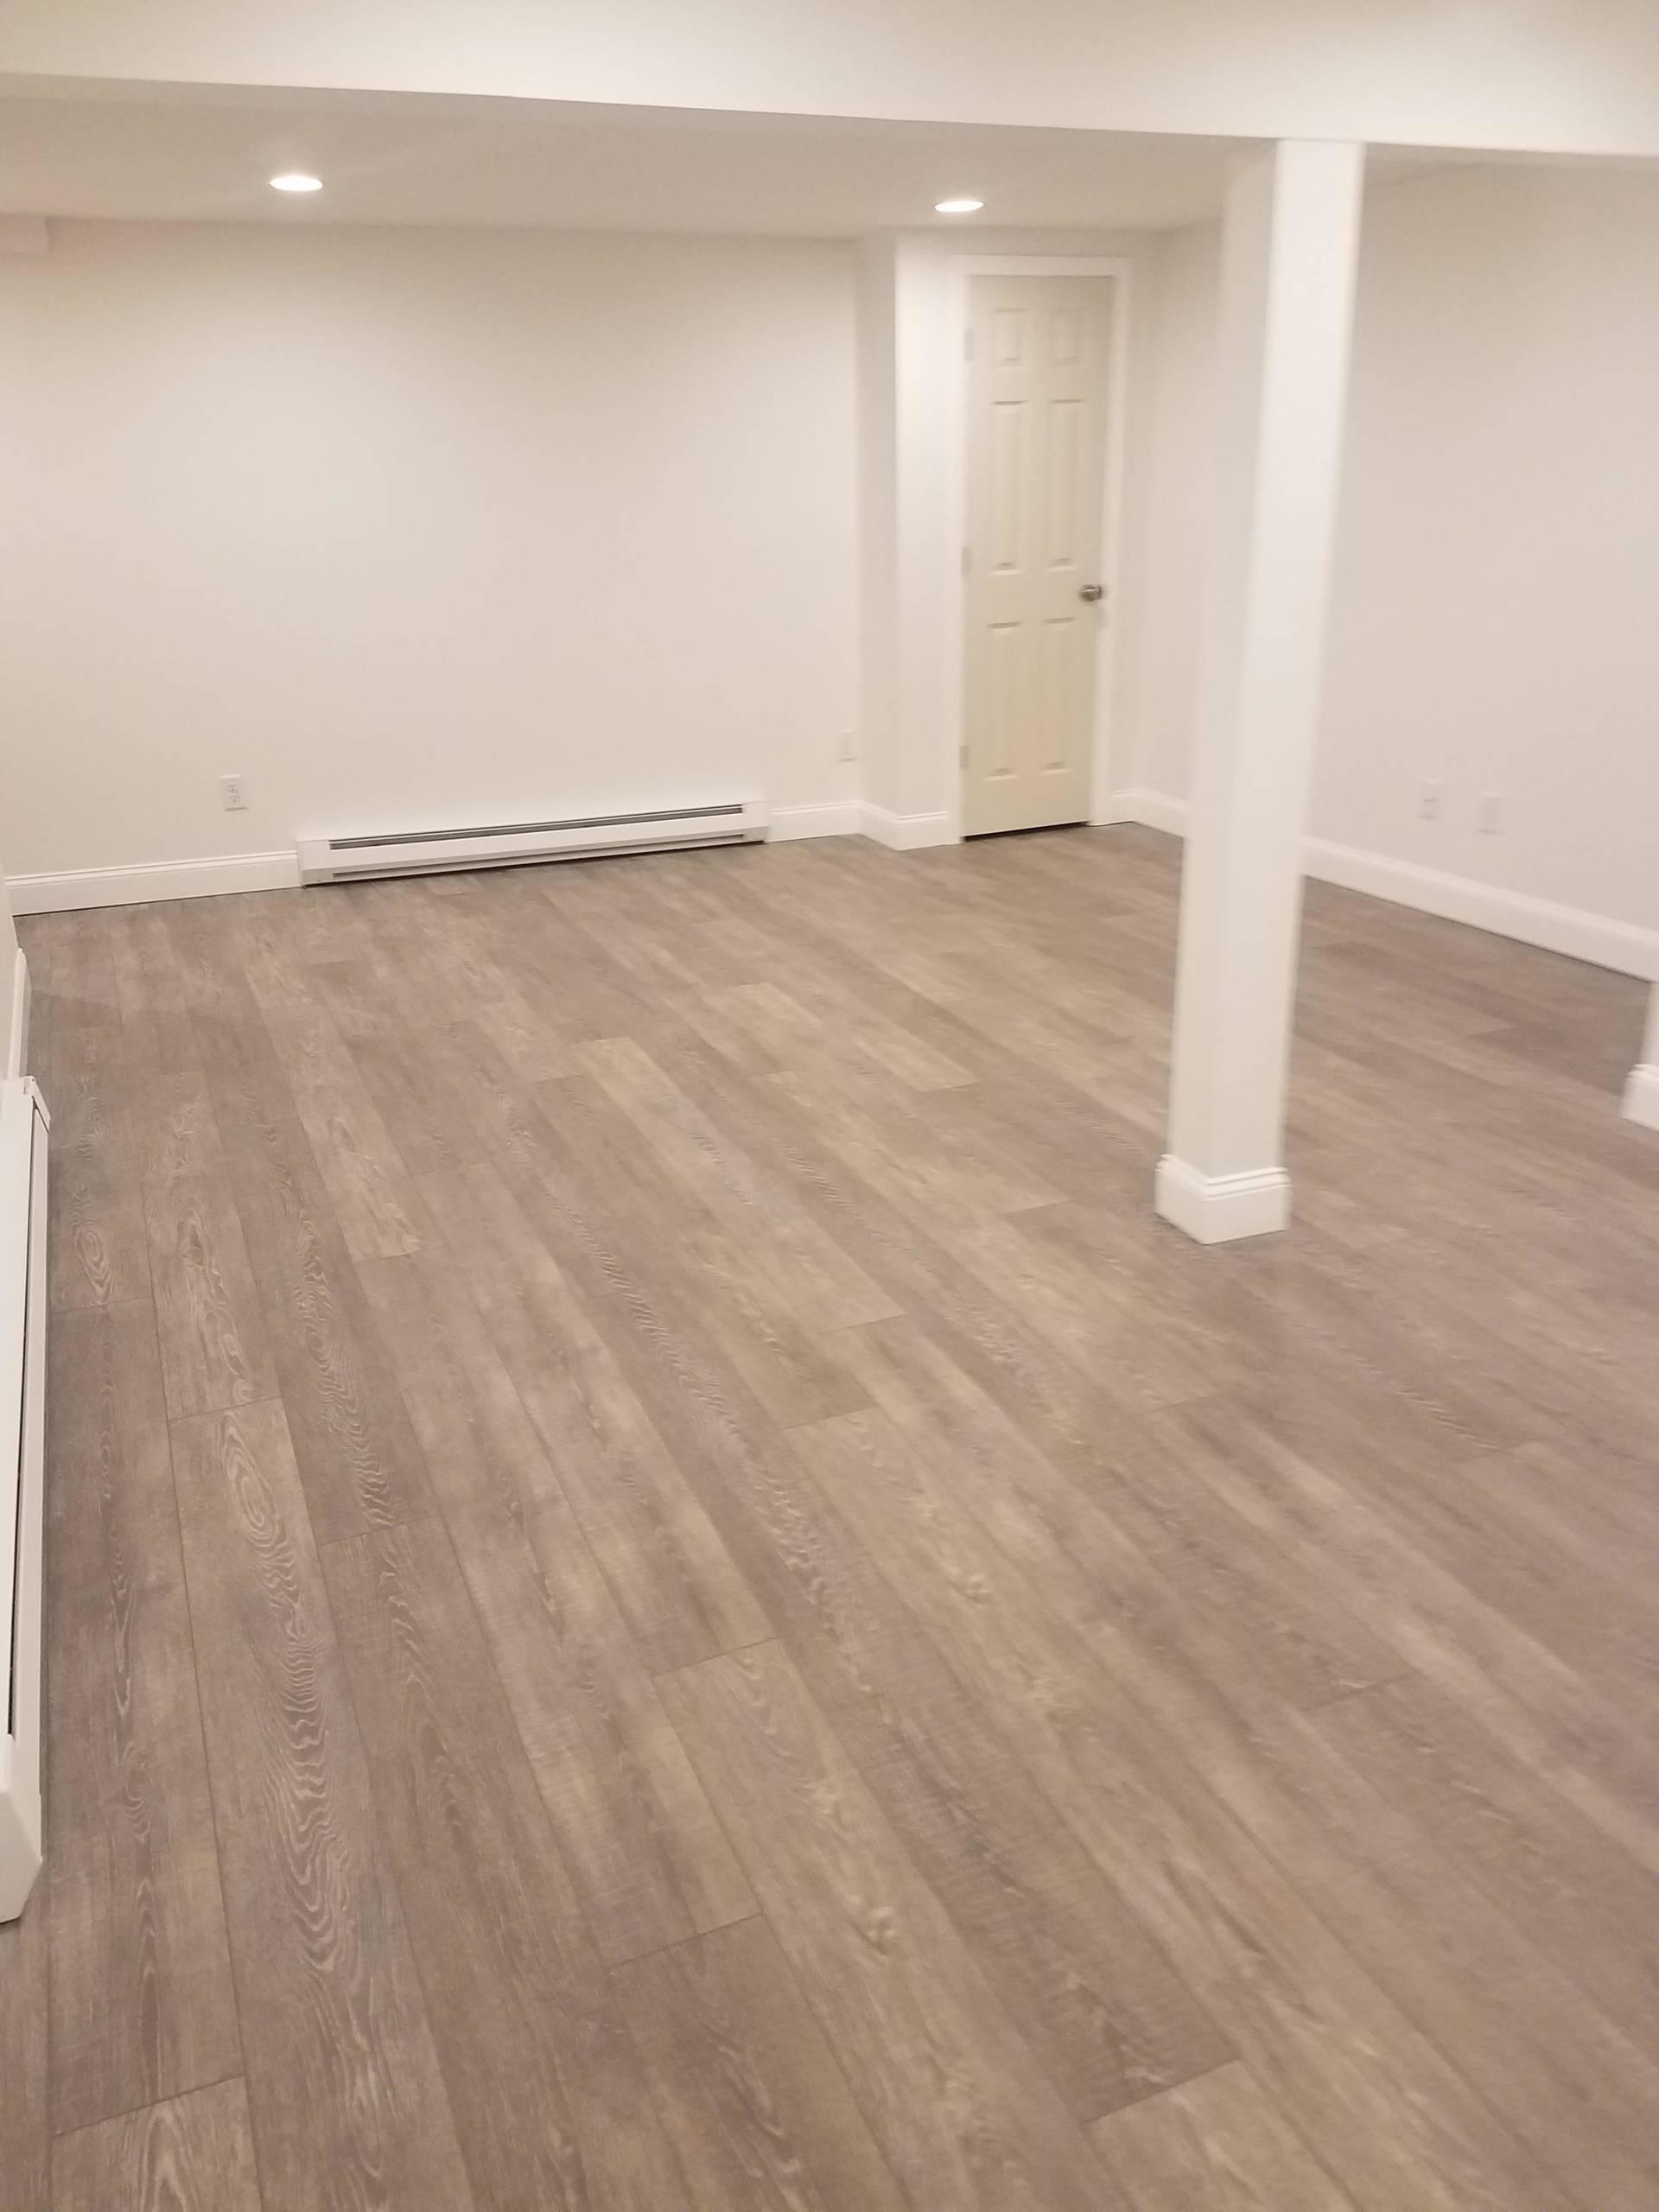 Vinyl Plank Flooring Basement Ideas, Vinyl Laminate Flooring For Basement